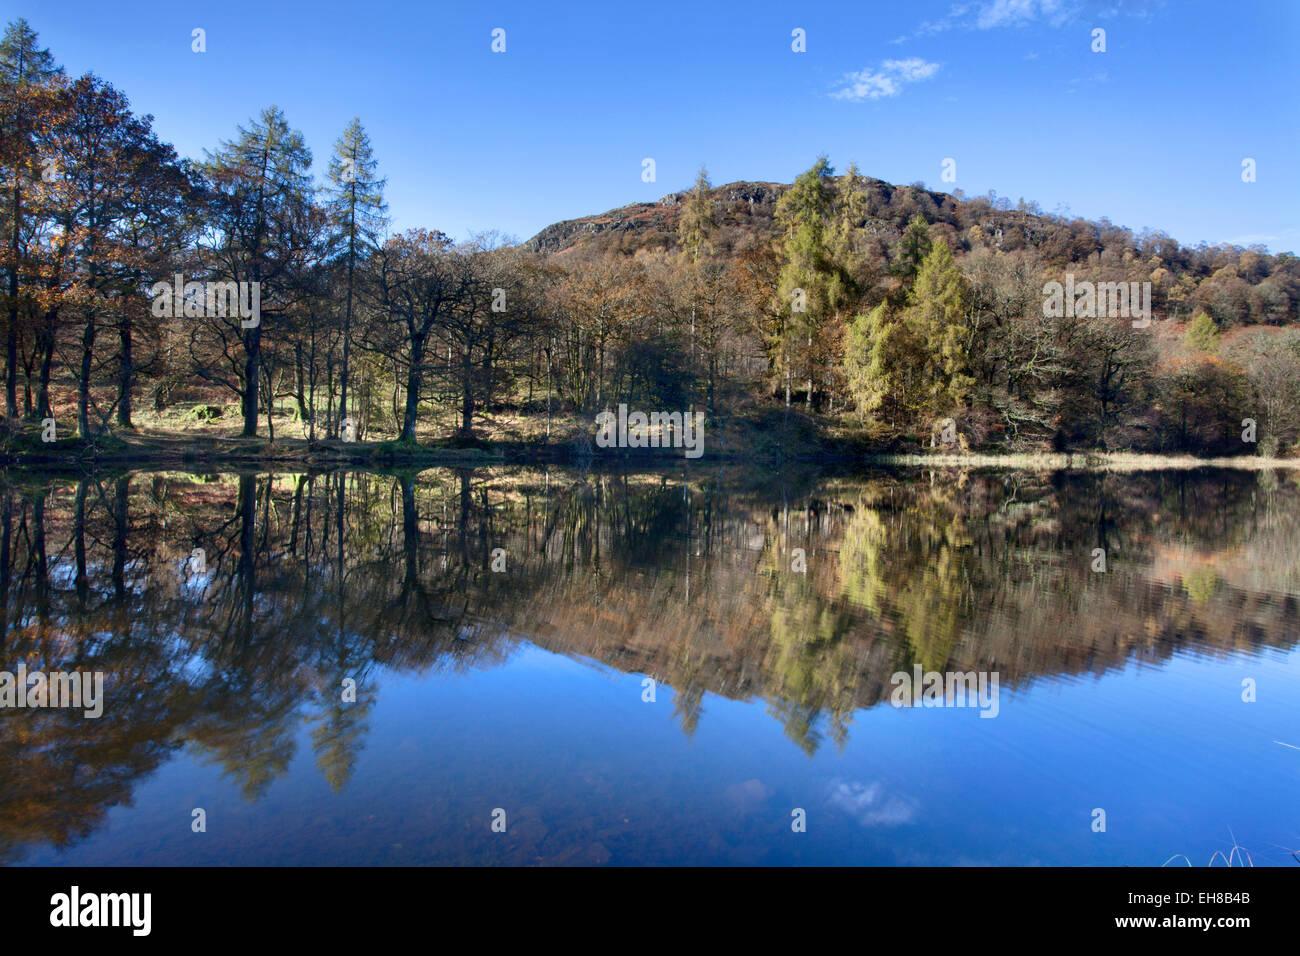 Yew Tree Tarn in autumn, Lake District National Park, Cumbria, England, United Kingdom, Europe - Stock Image